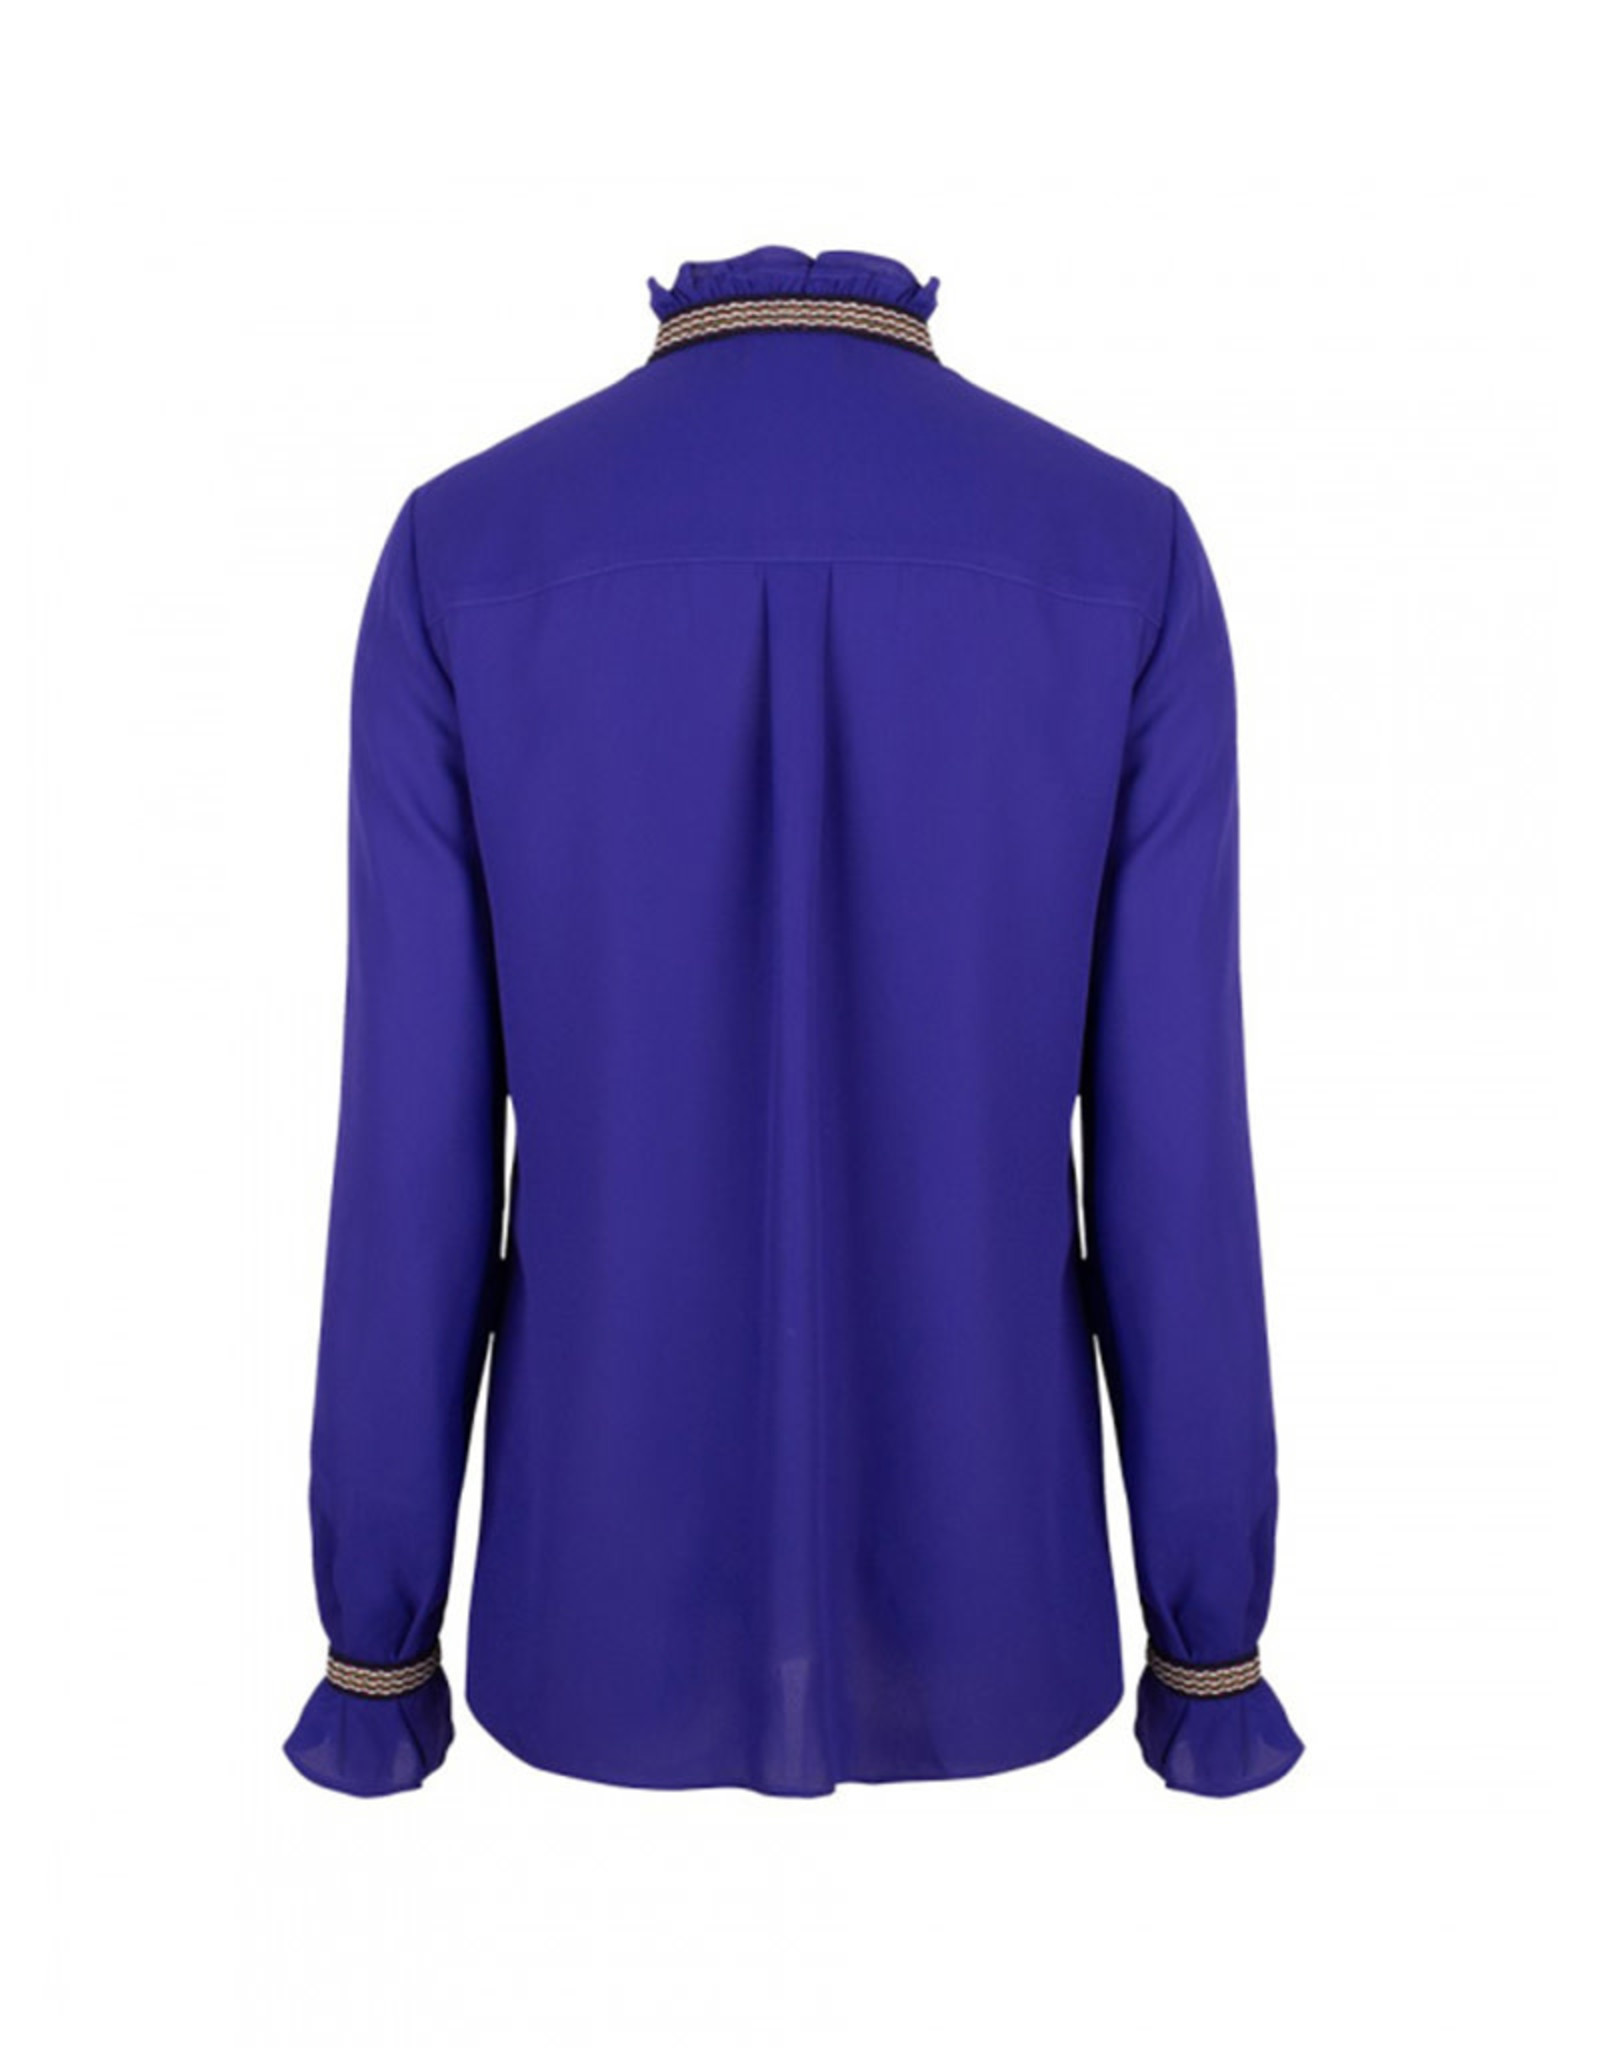 dante6 Pippa ruffle blouse